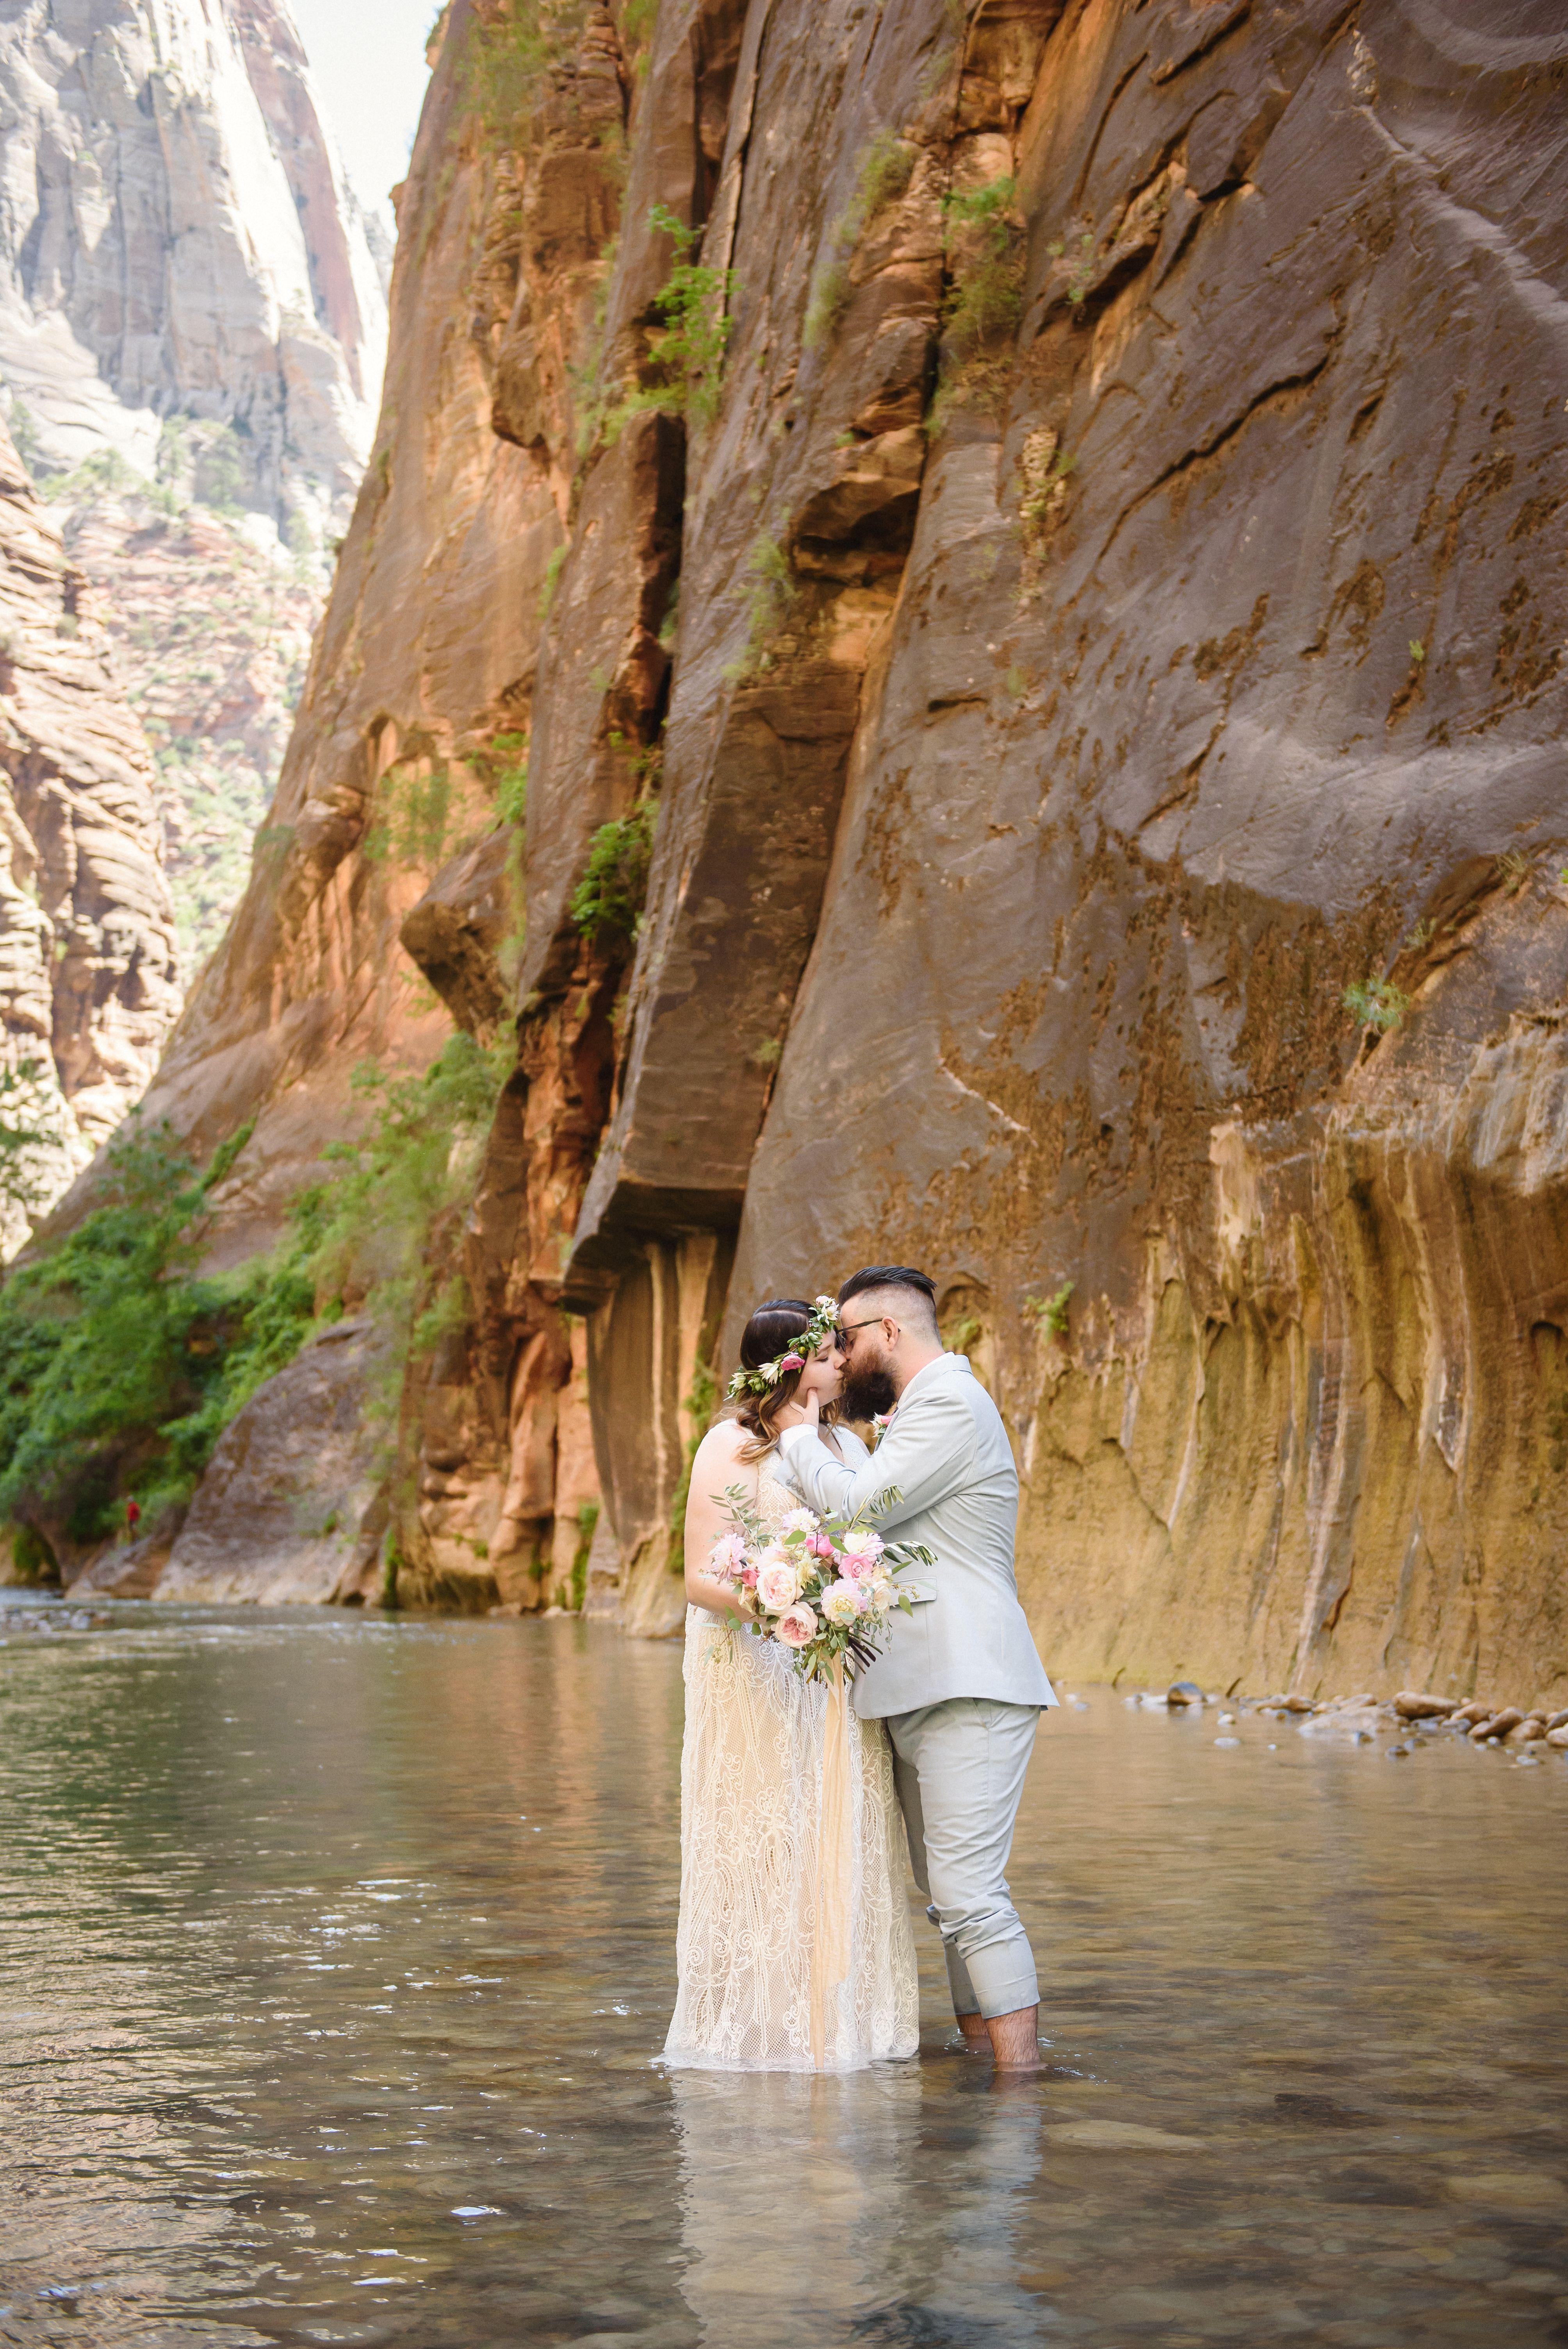 Zion National Park Wedding Photography Zion Narrows Water Park Weddings Zion National Park National Park Wedding